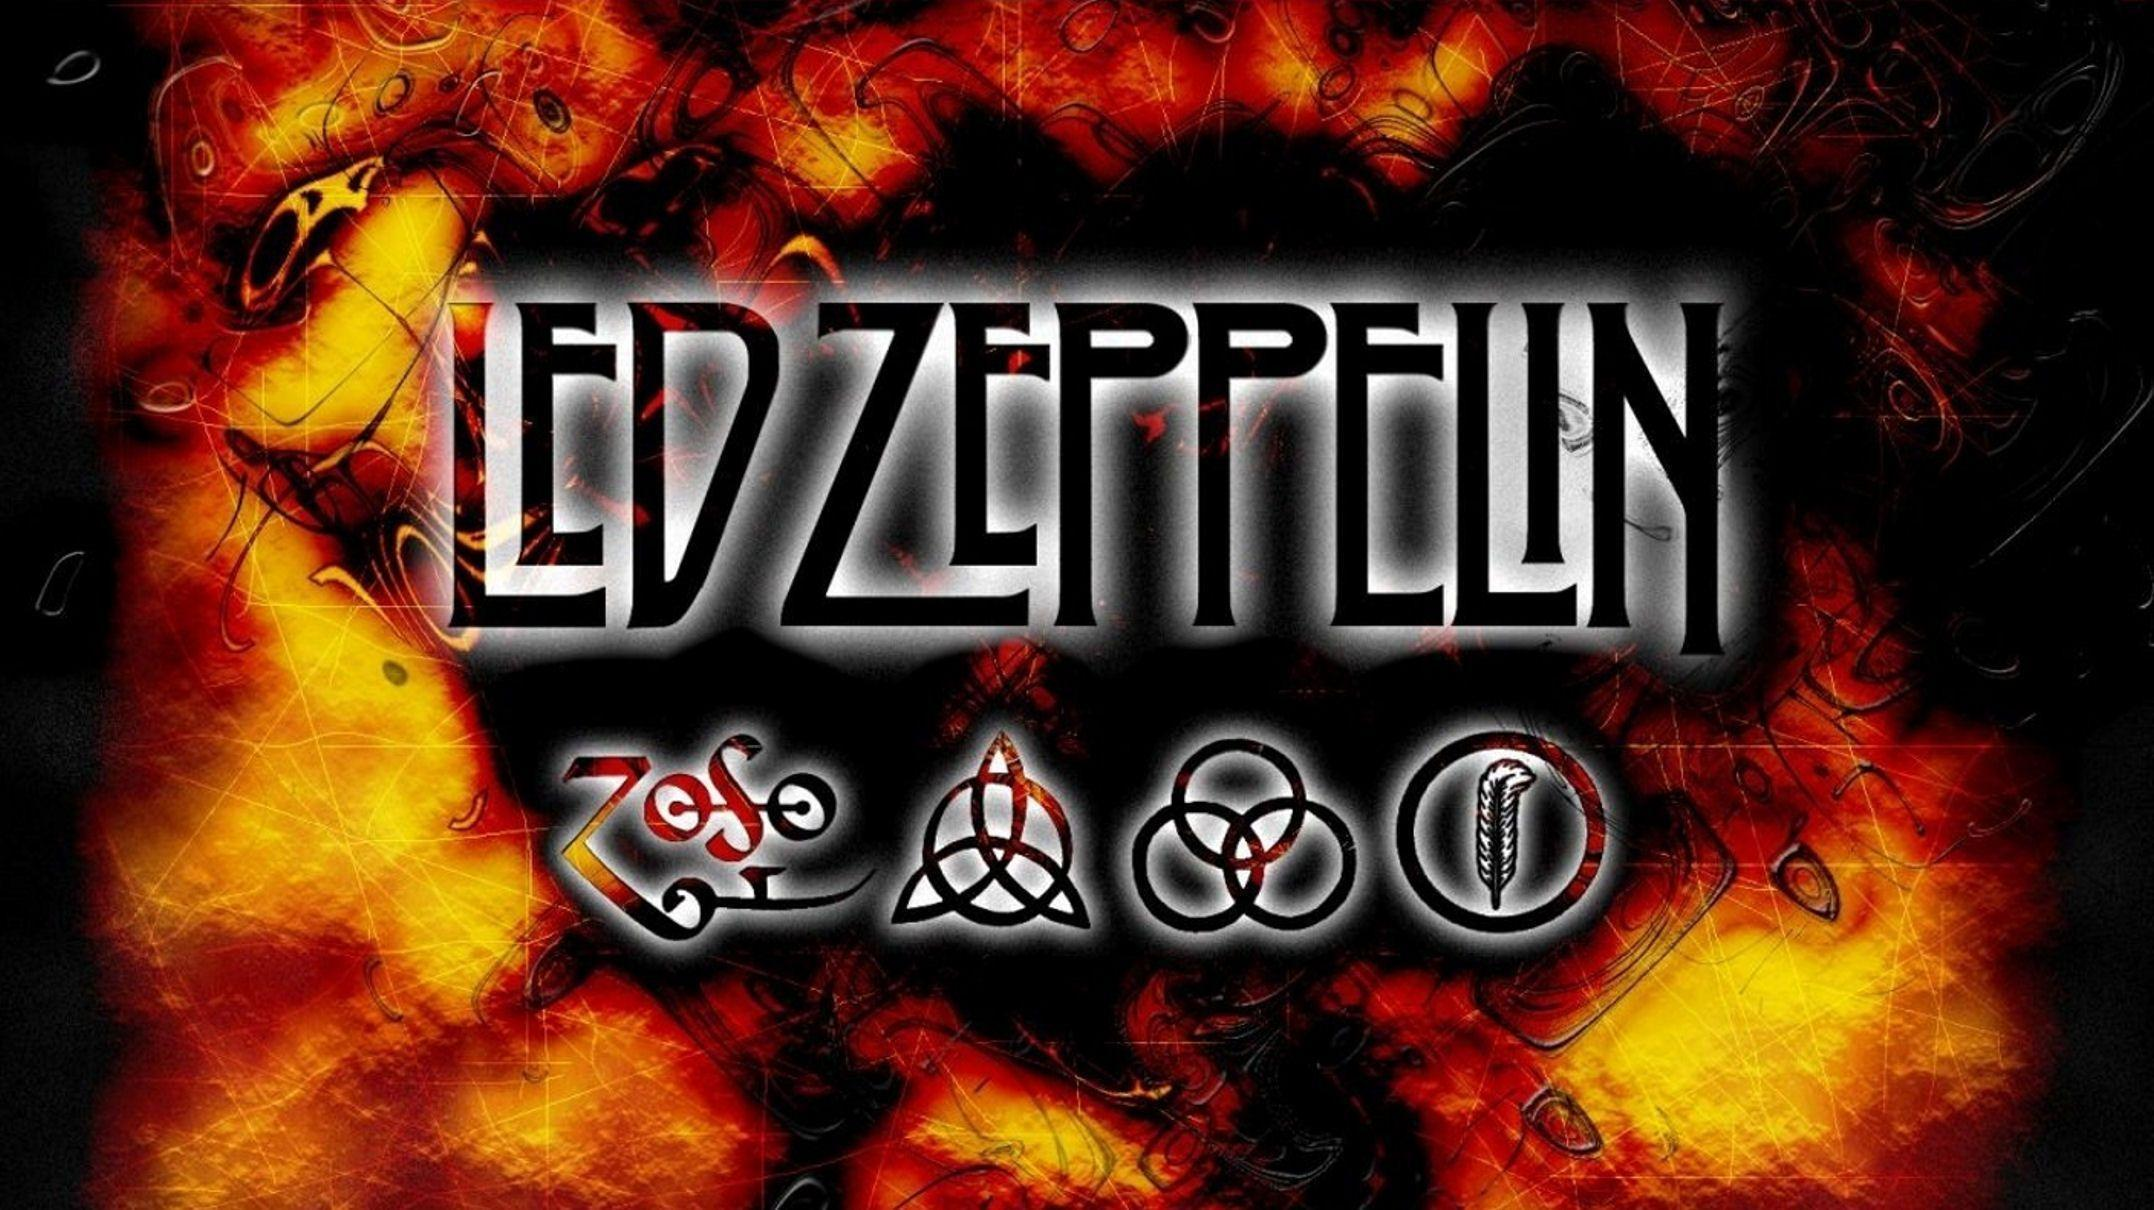 Led Zeppelin Wallpapers HD Download